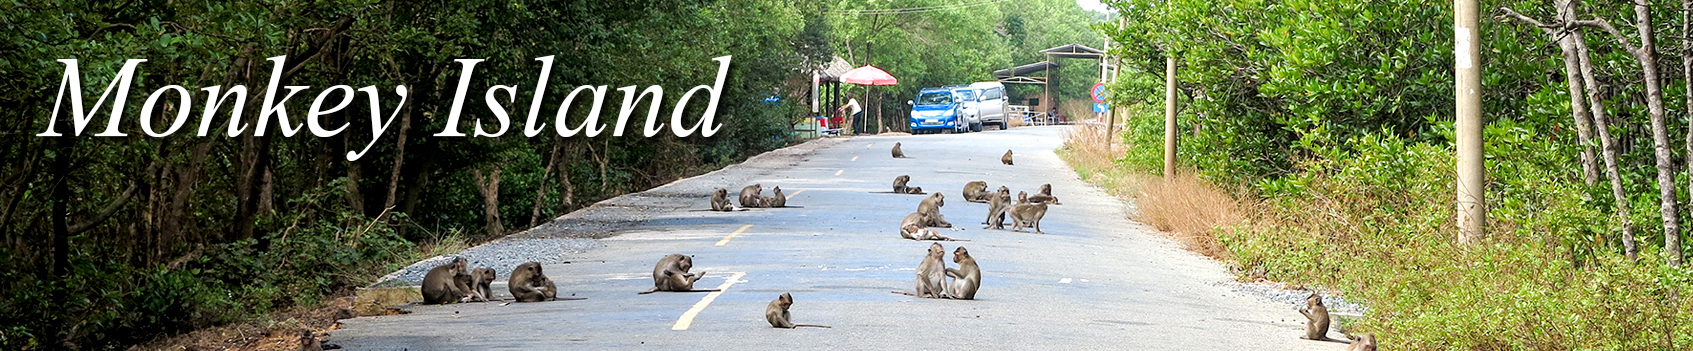 Day Rental: Monkey Island in Can Gio